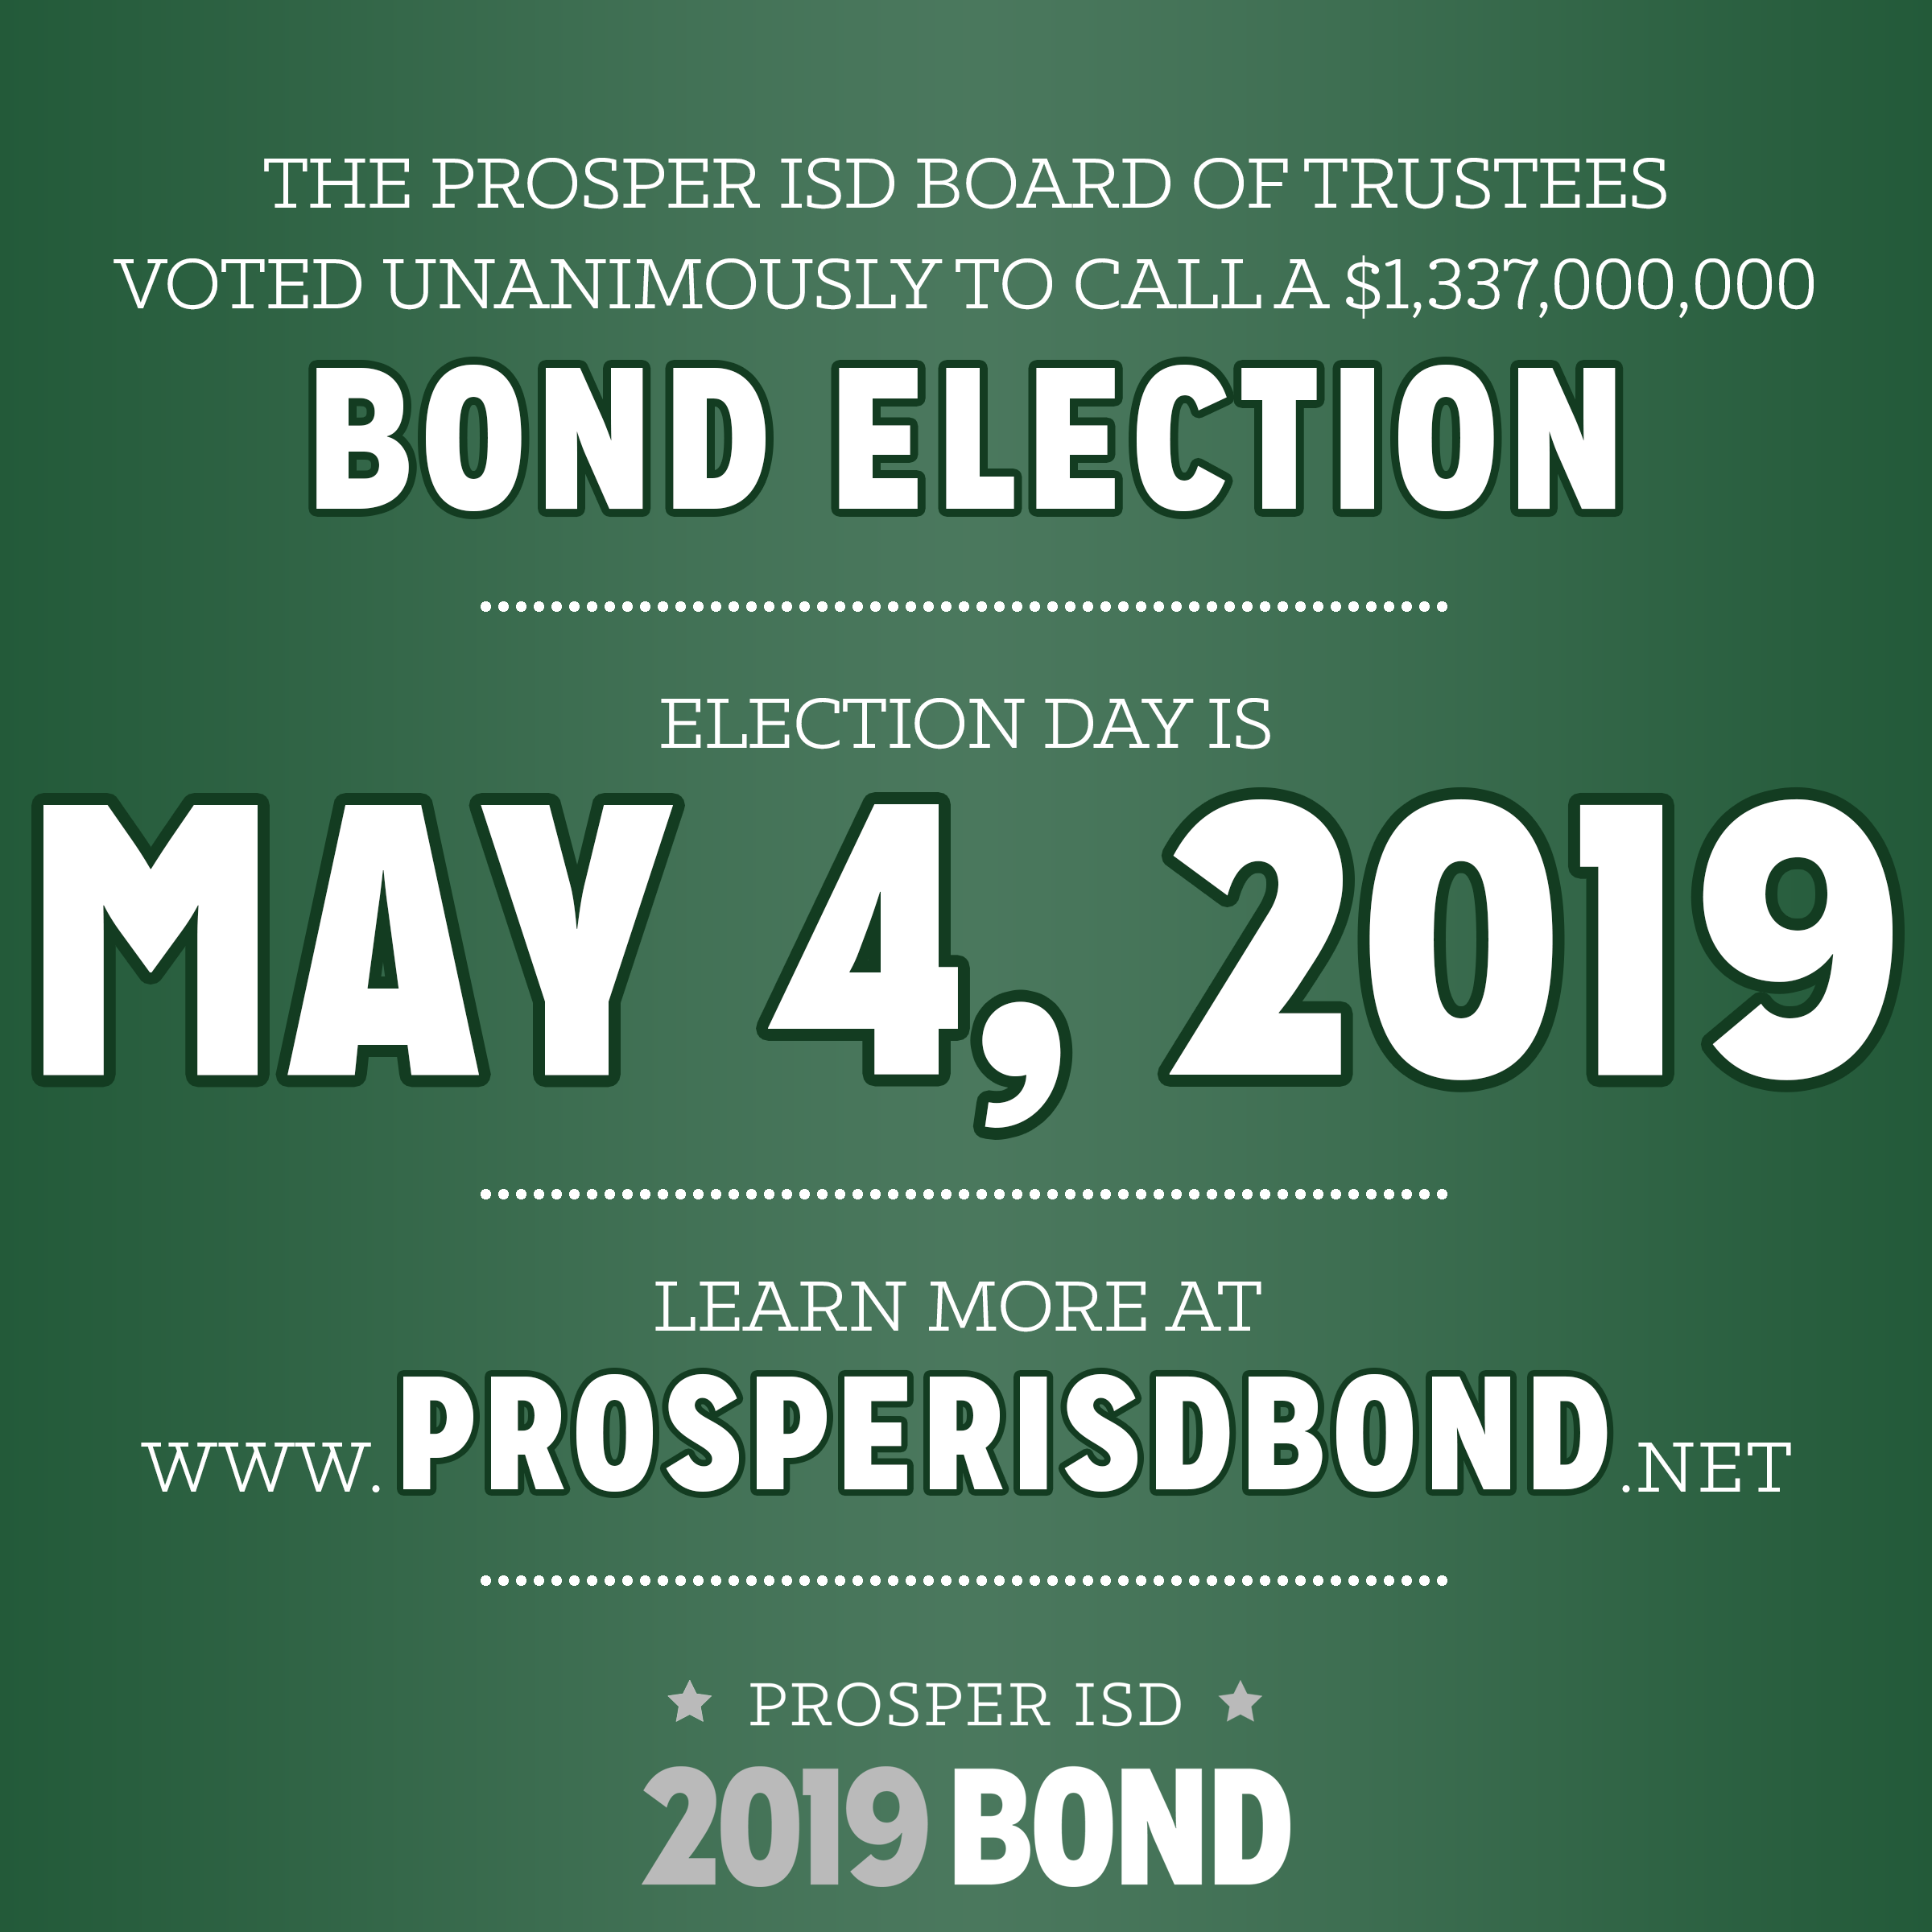 Prosper ISD School Board Calls for a Bond Election